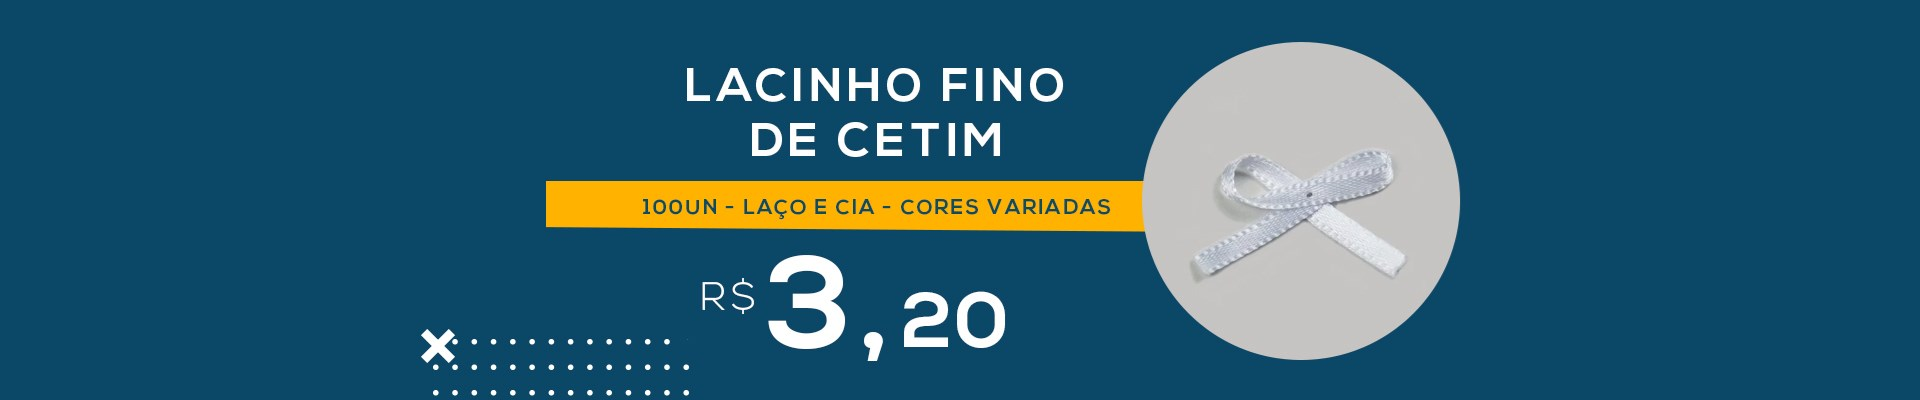 Lacinho Fino de Cetim - 100un - Laço e Cia